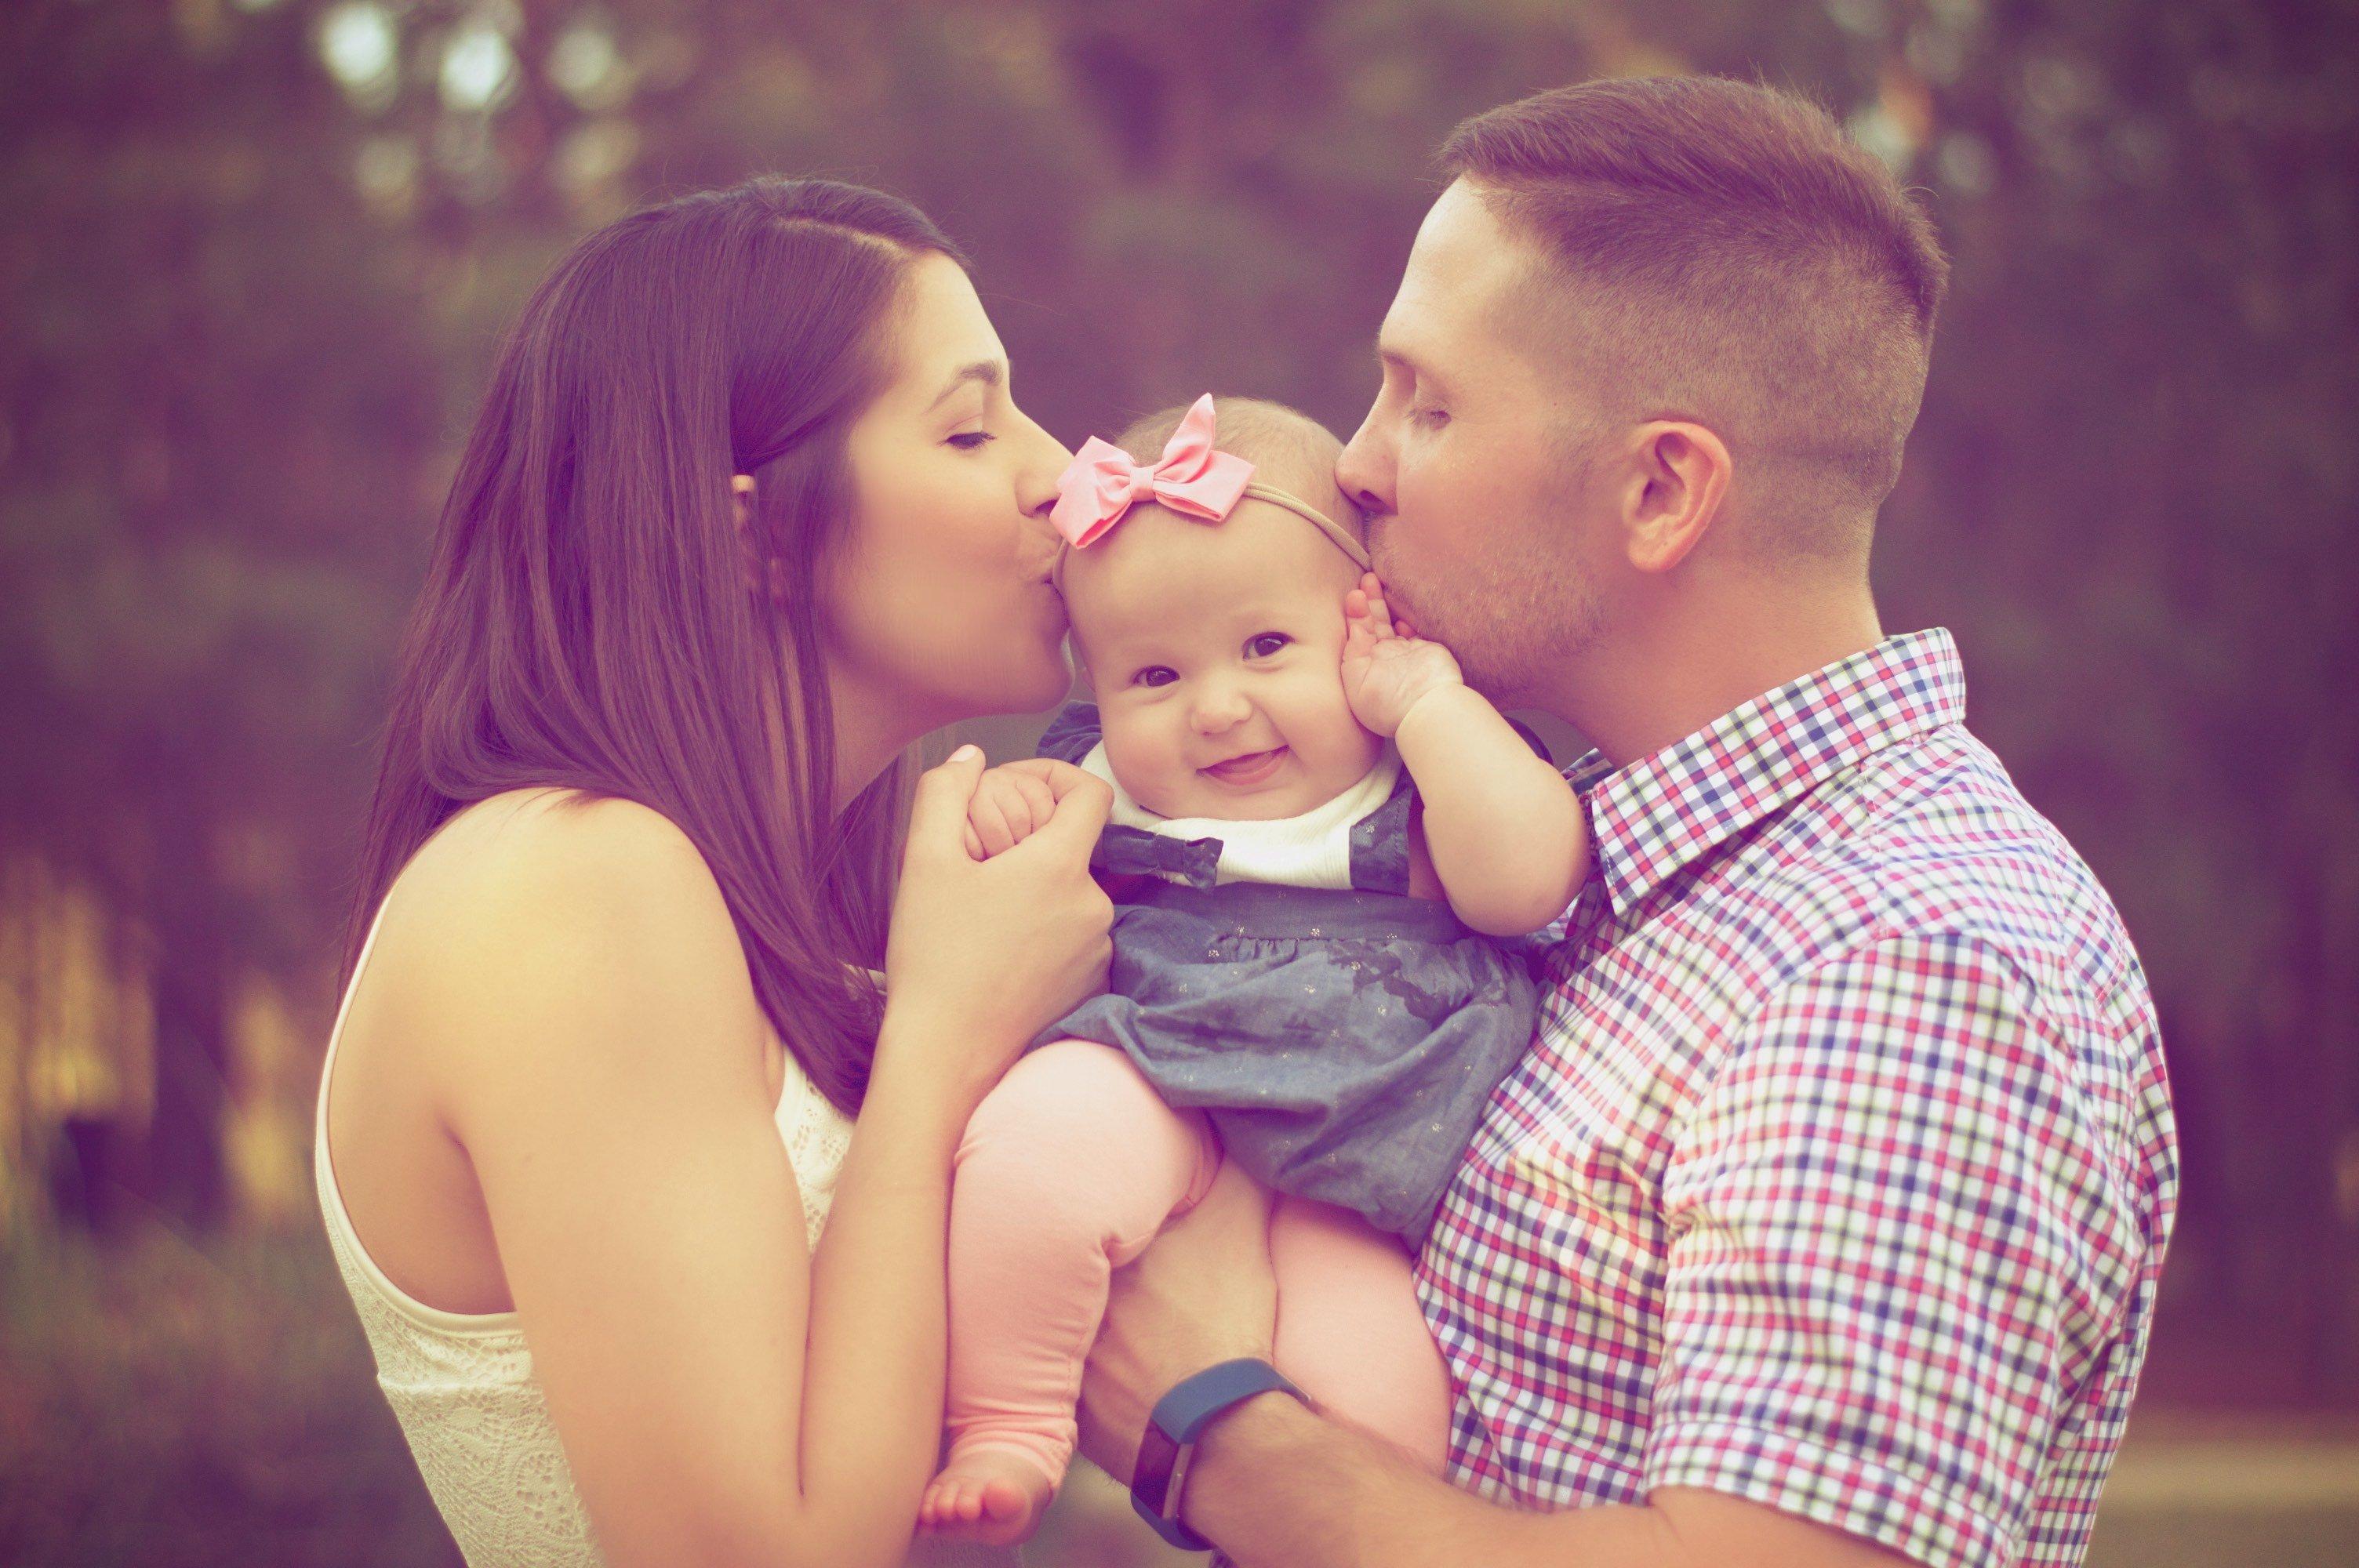 millennial parenting-millennial parenting styles